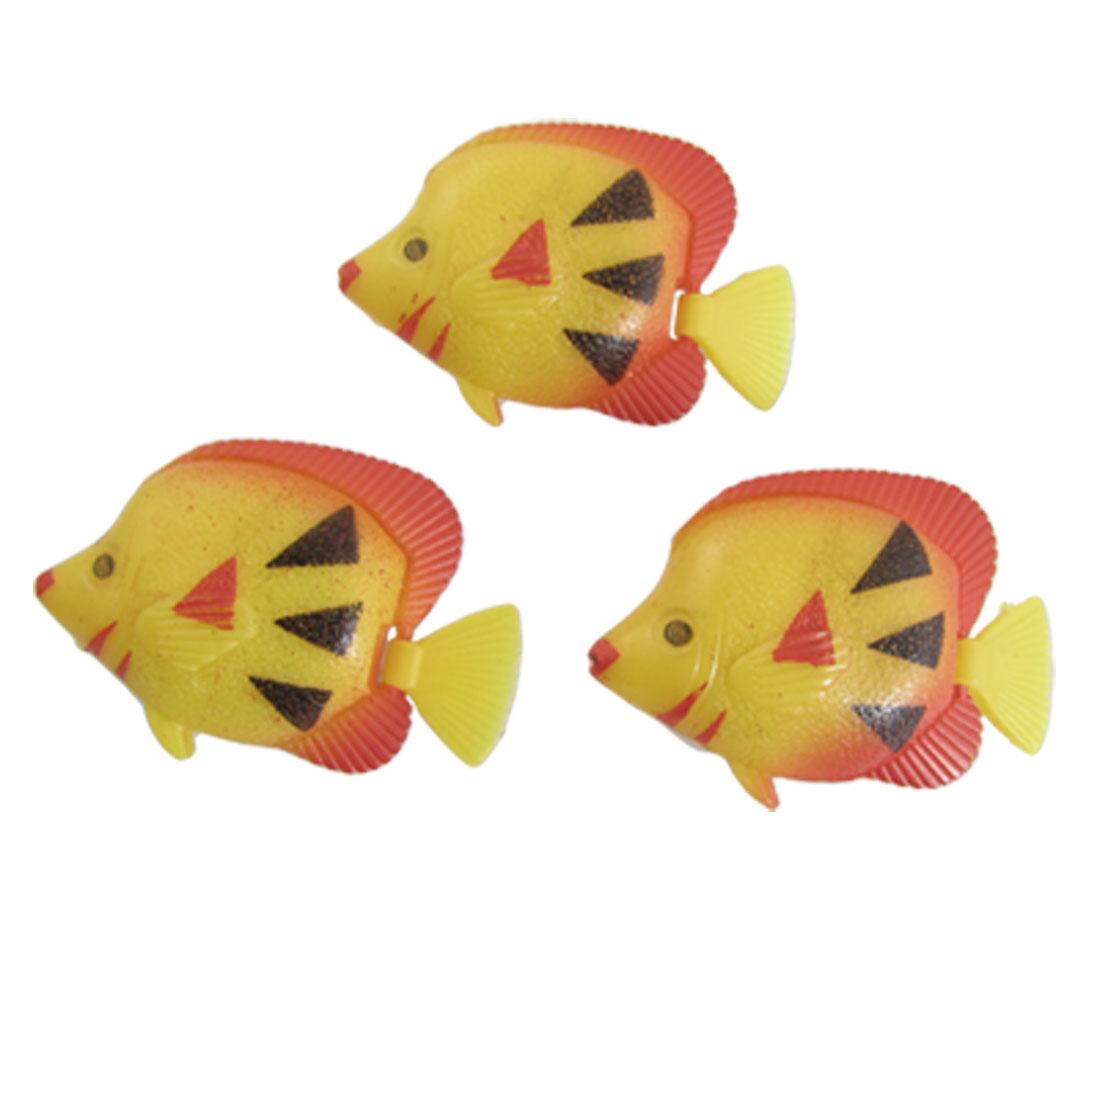 Red Yellow Atificial Ocean Fish Aquarium Tank Ornament 3 Pcs